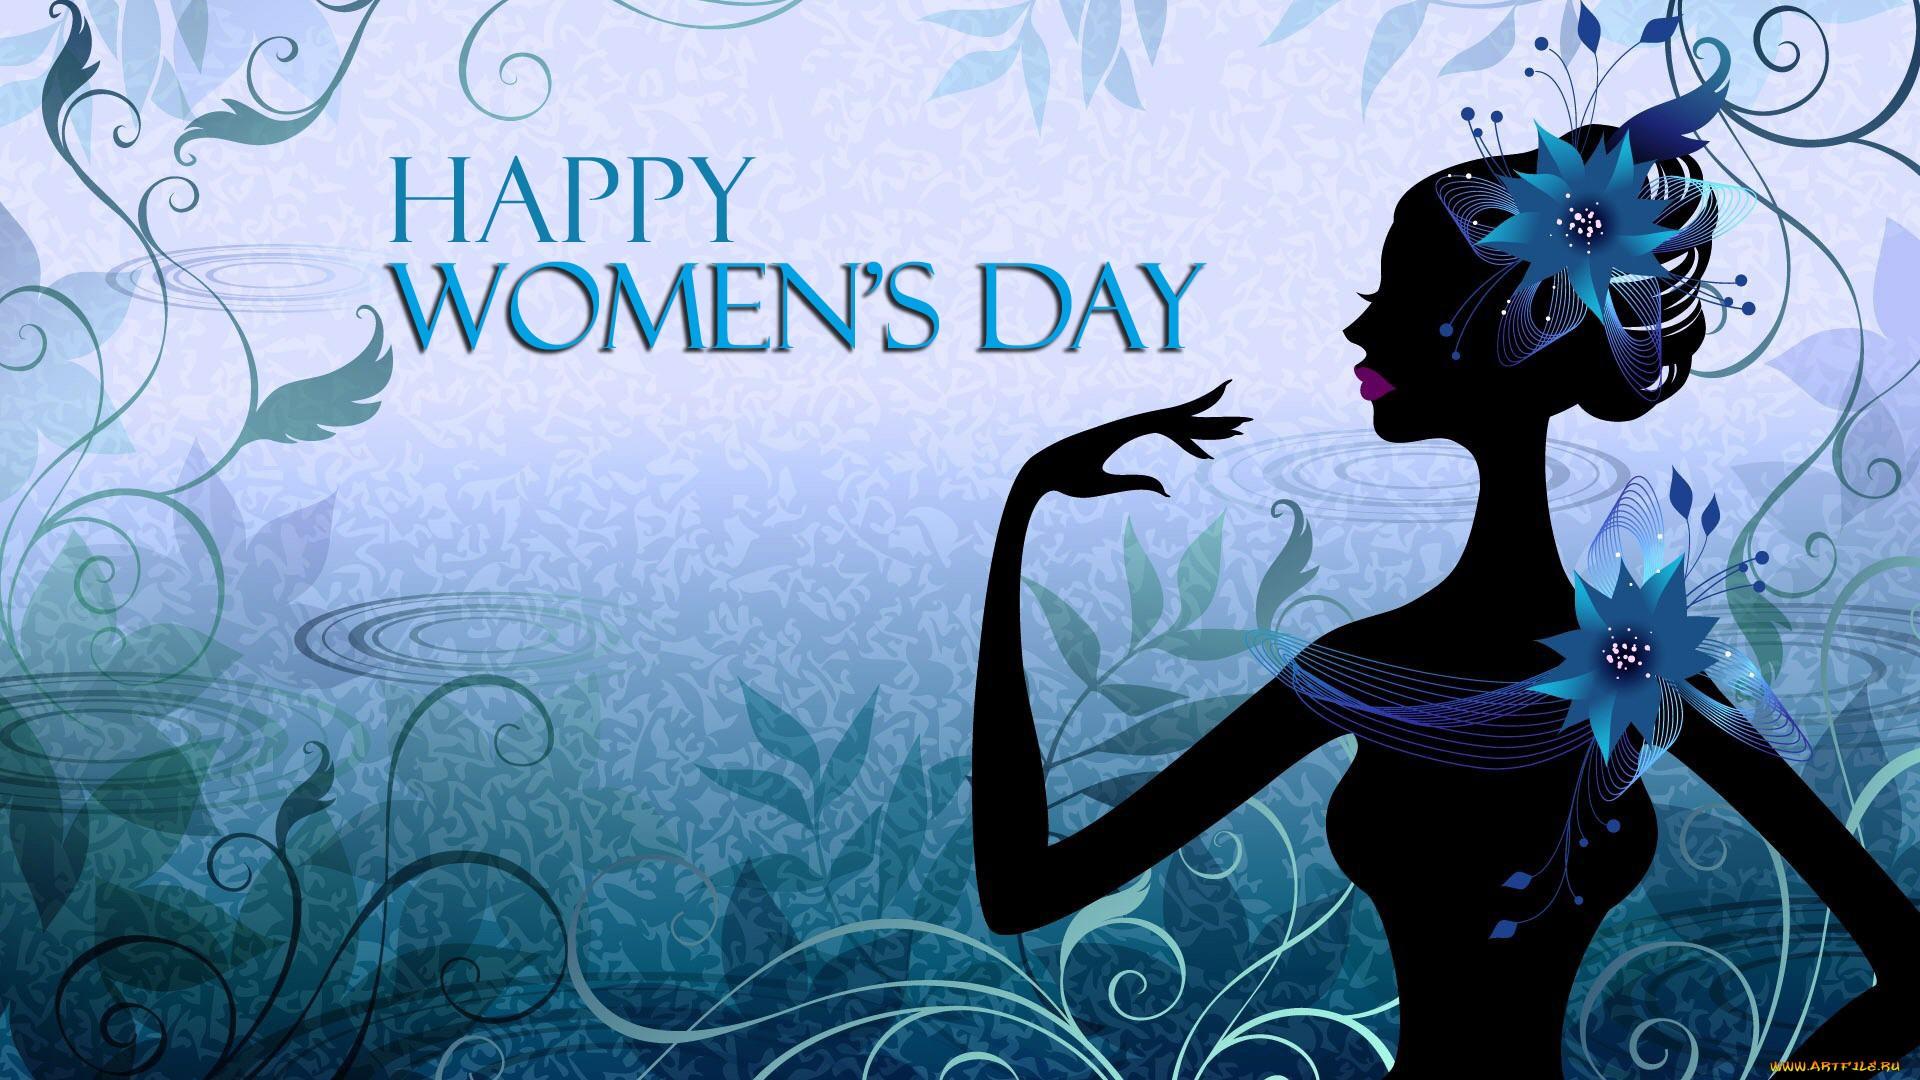 International Women's Day image theme